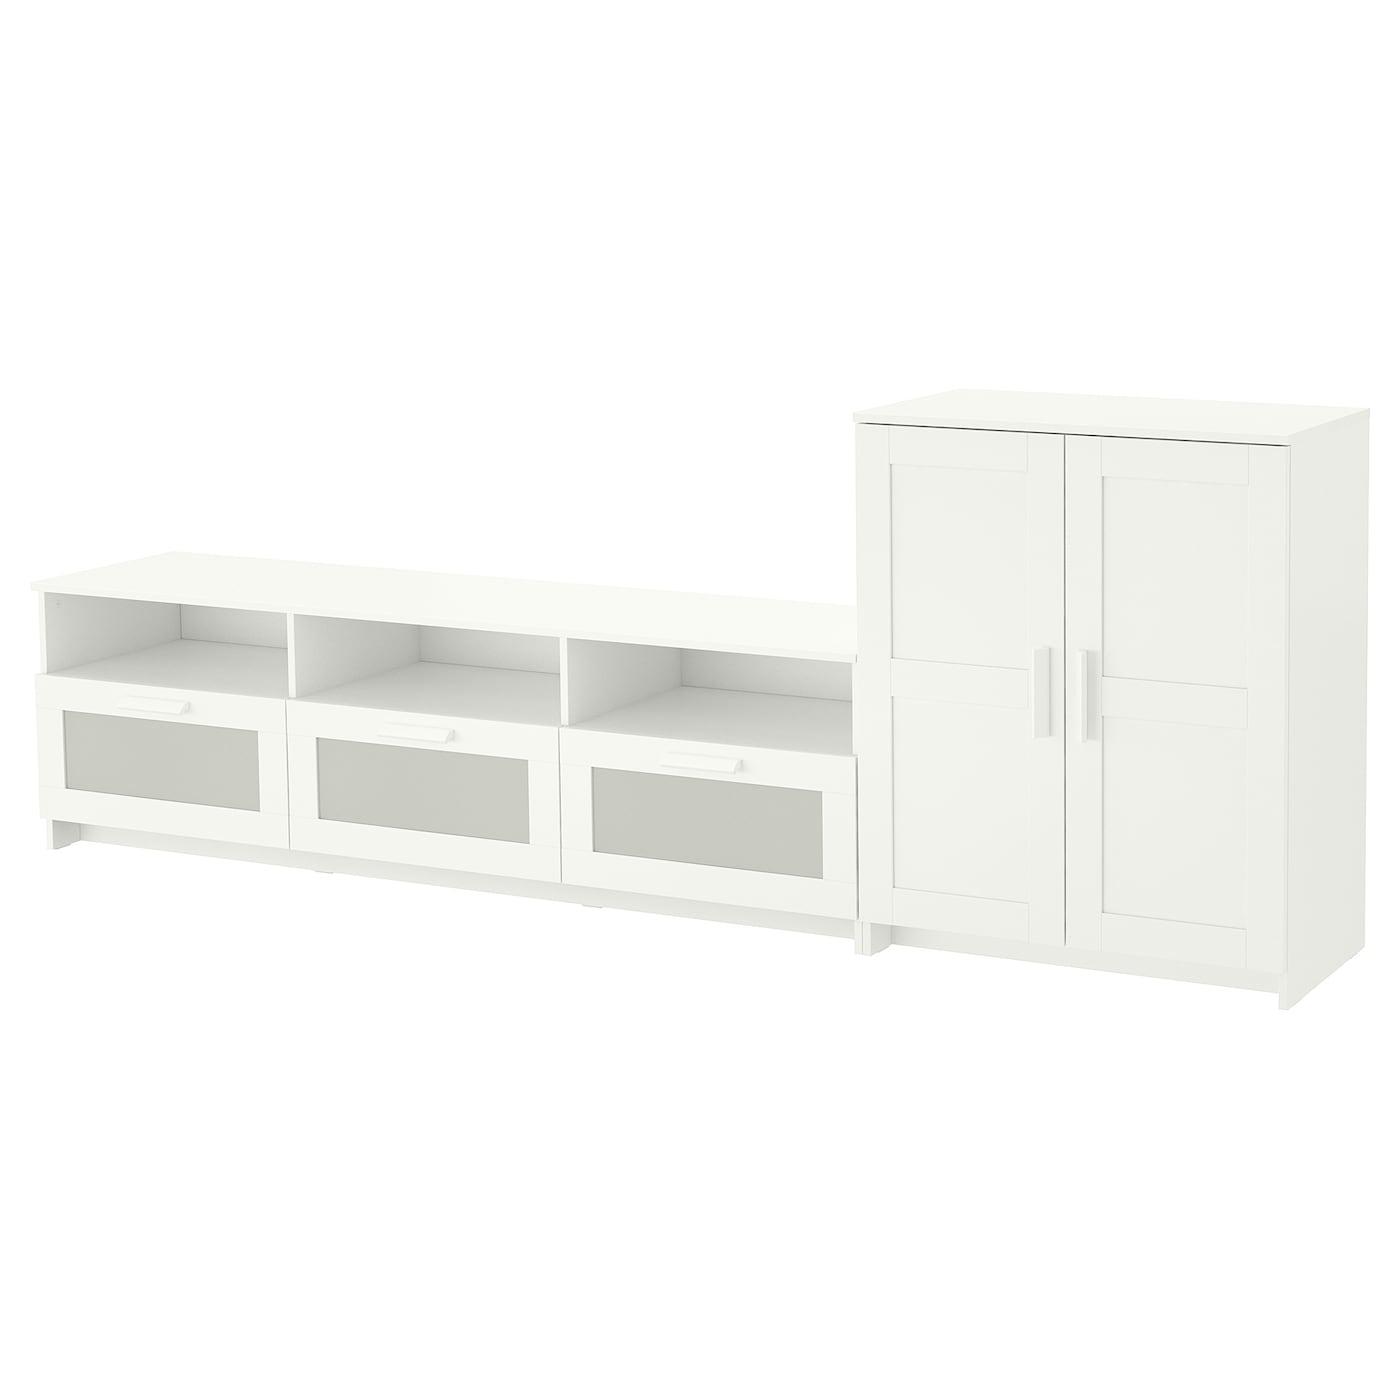 Brimnes mueble tv con almacenaje blanco 258 x 41 x 95 cm for Mueble tv ikea